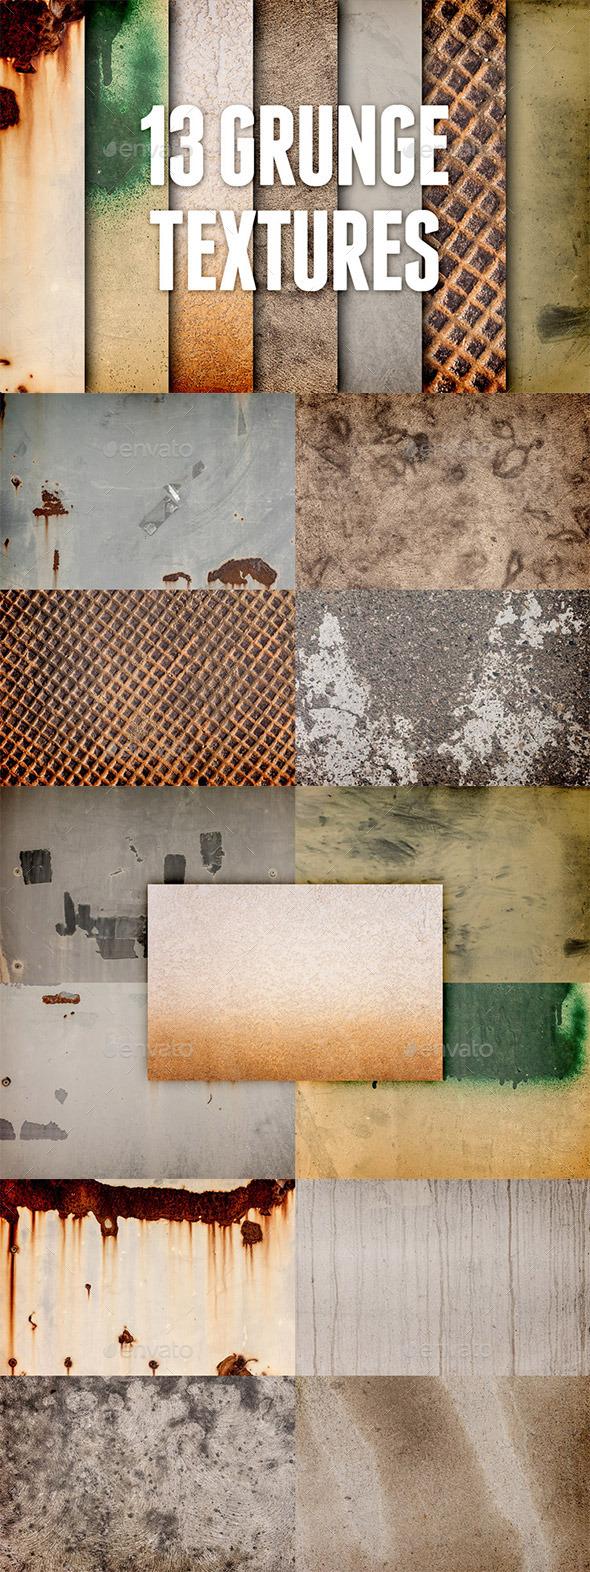 Grunge Textures Pack 1 - Industrial / Grunge Textures